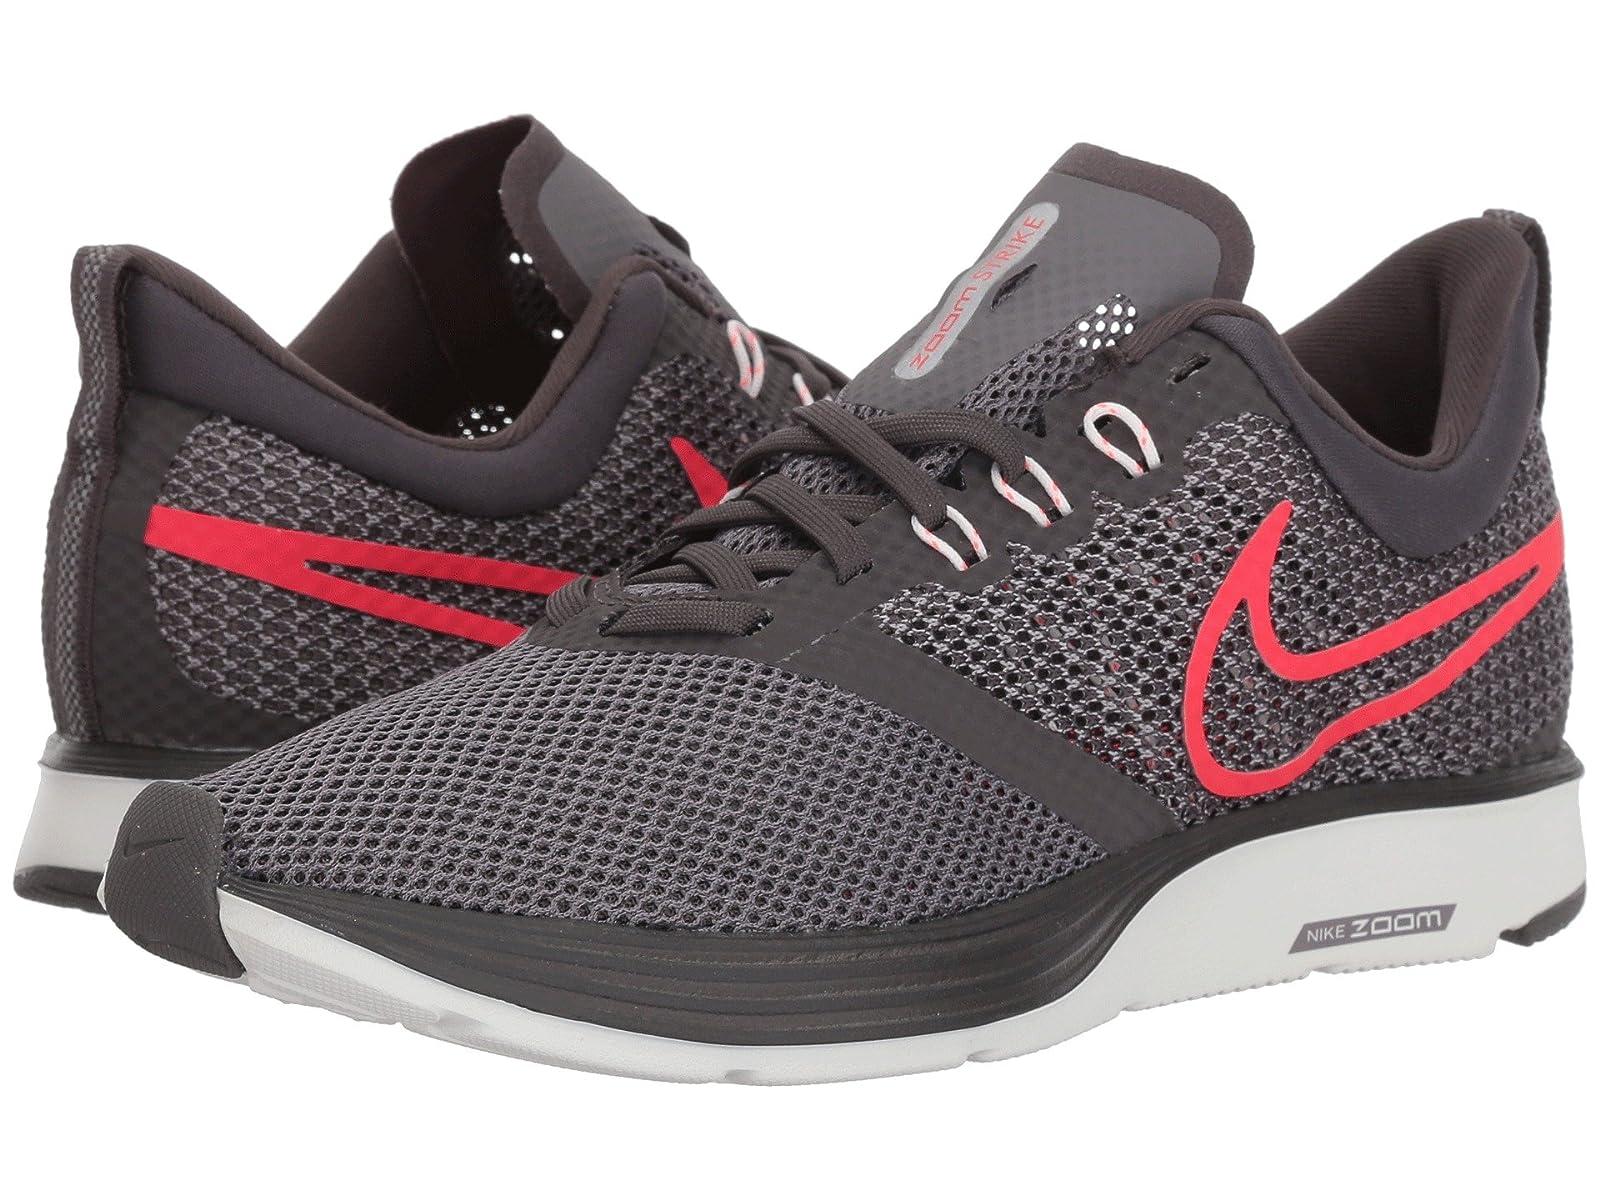 Nike Zoom StrikeAtmospheric grades have affordable shoes